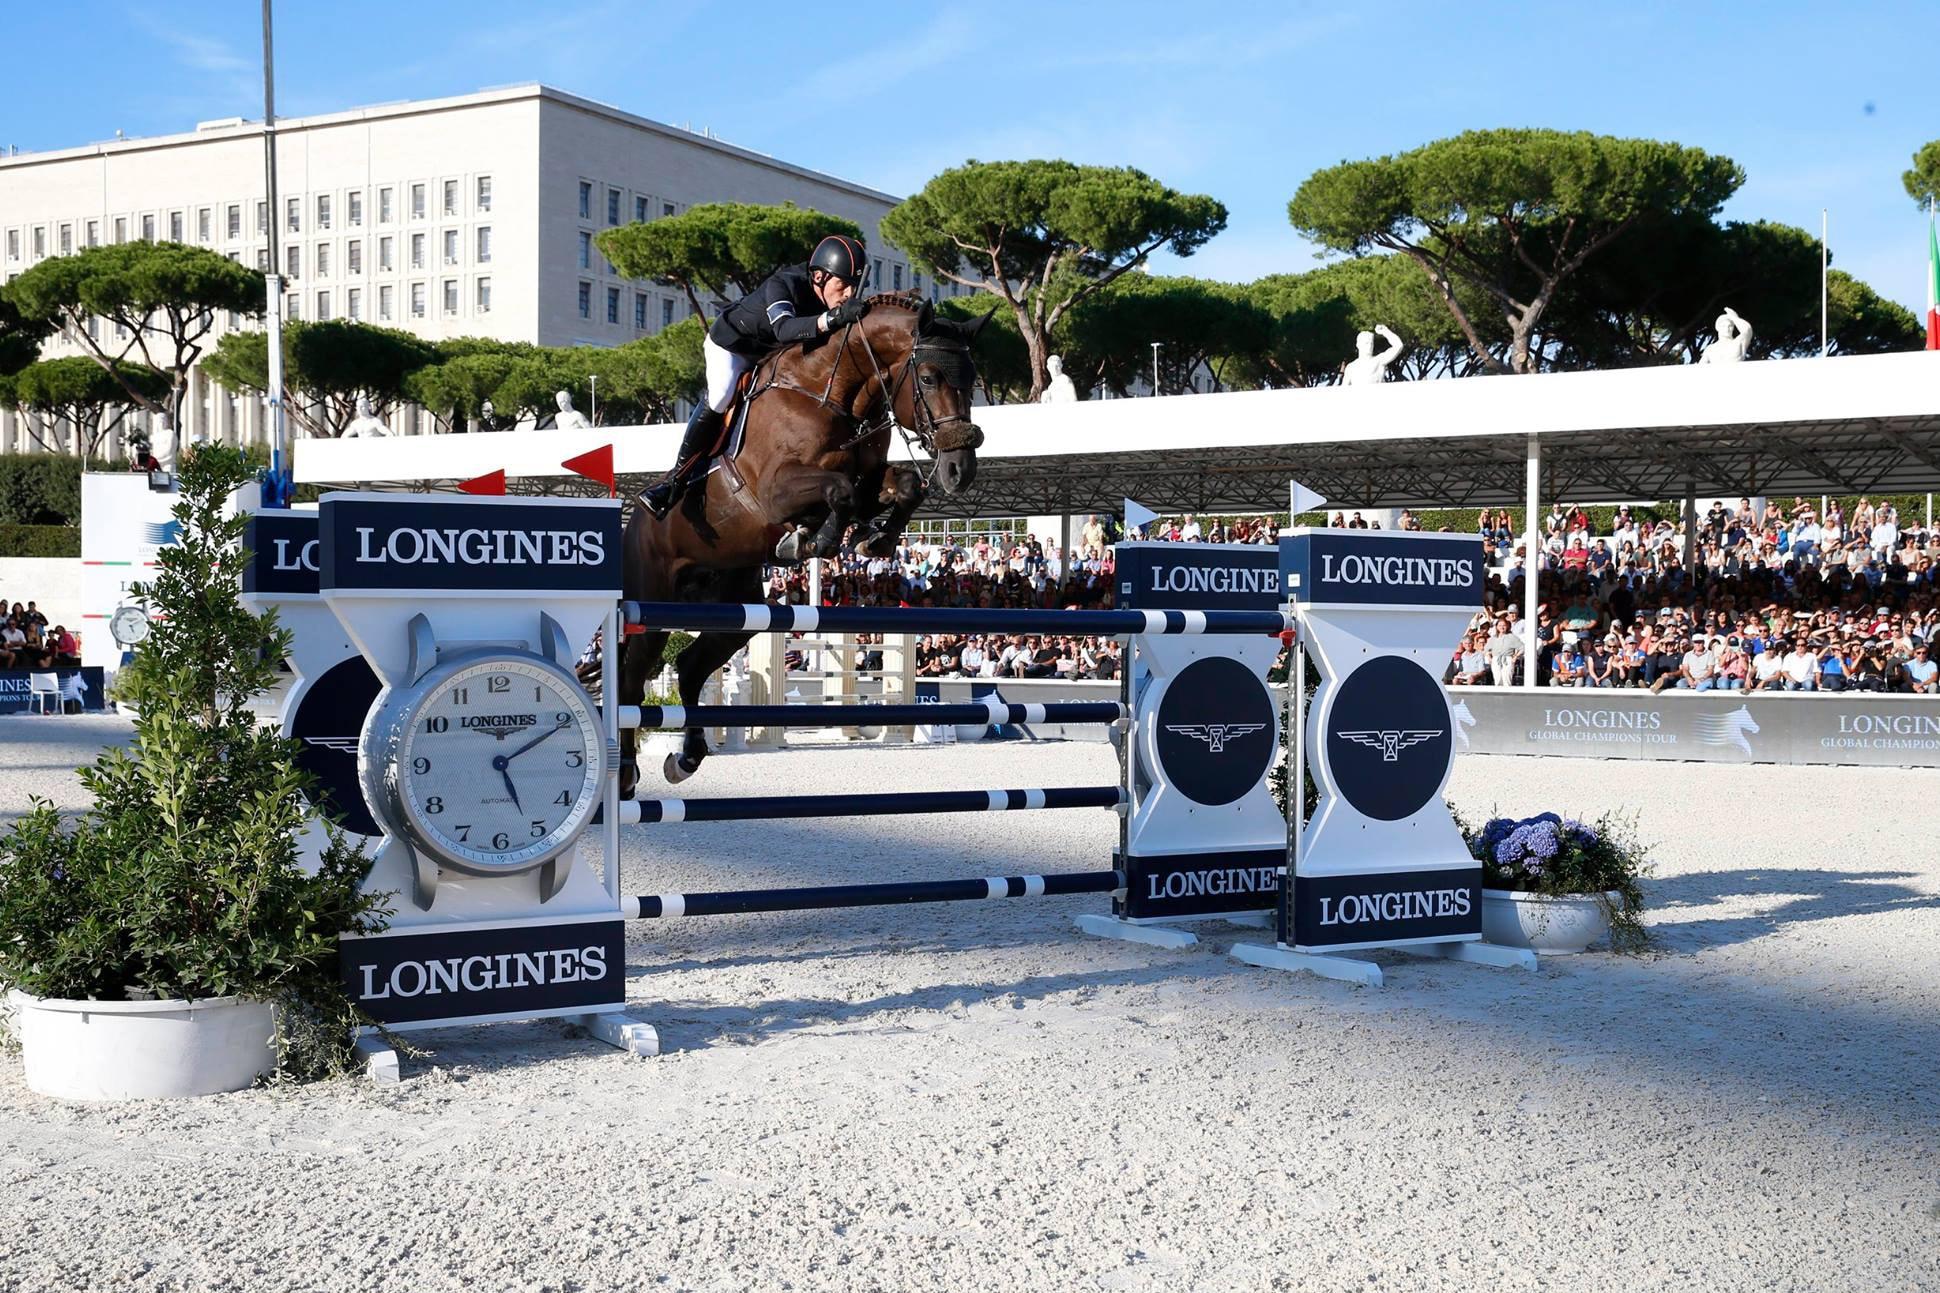 Equitazione, il Global Champions Tour torna a Roma